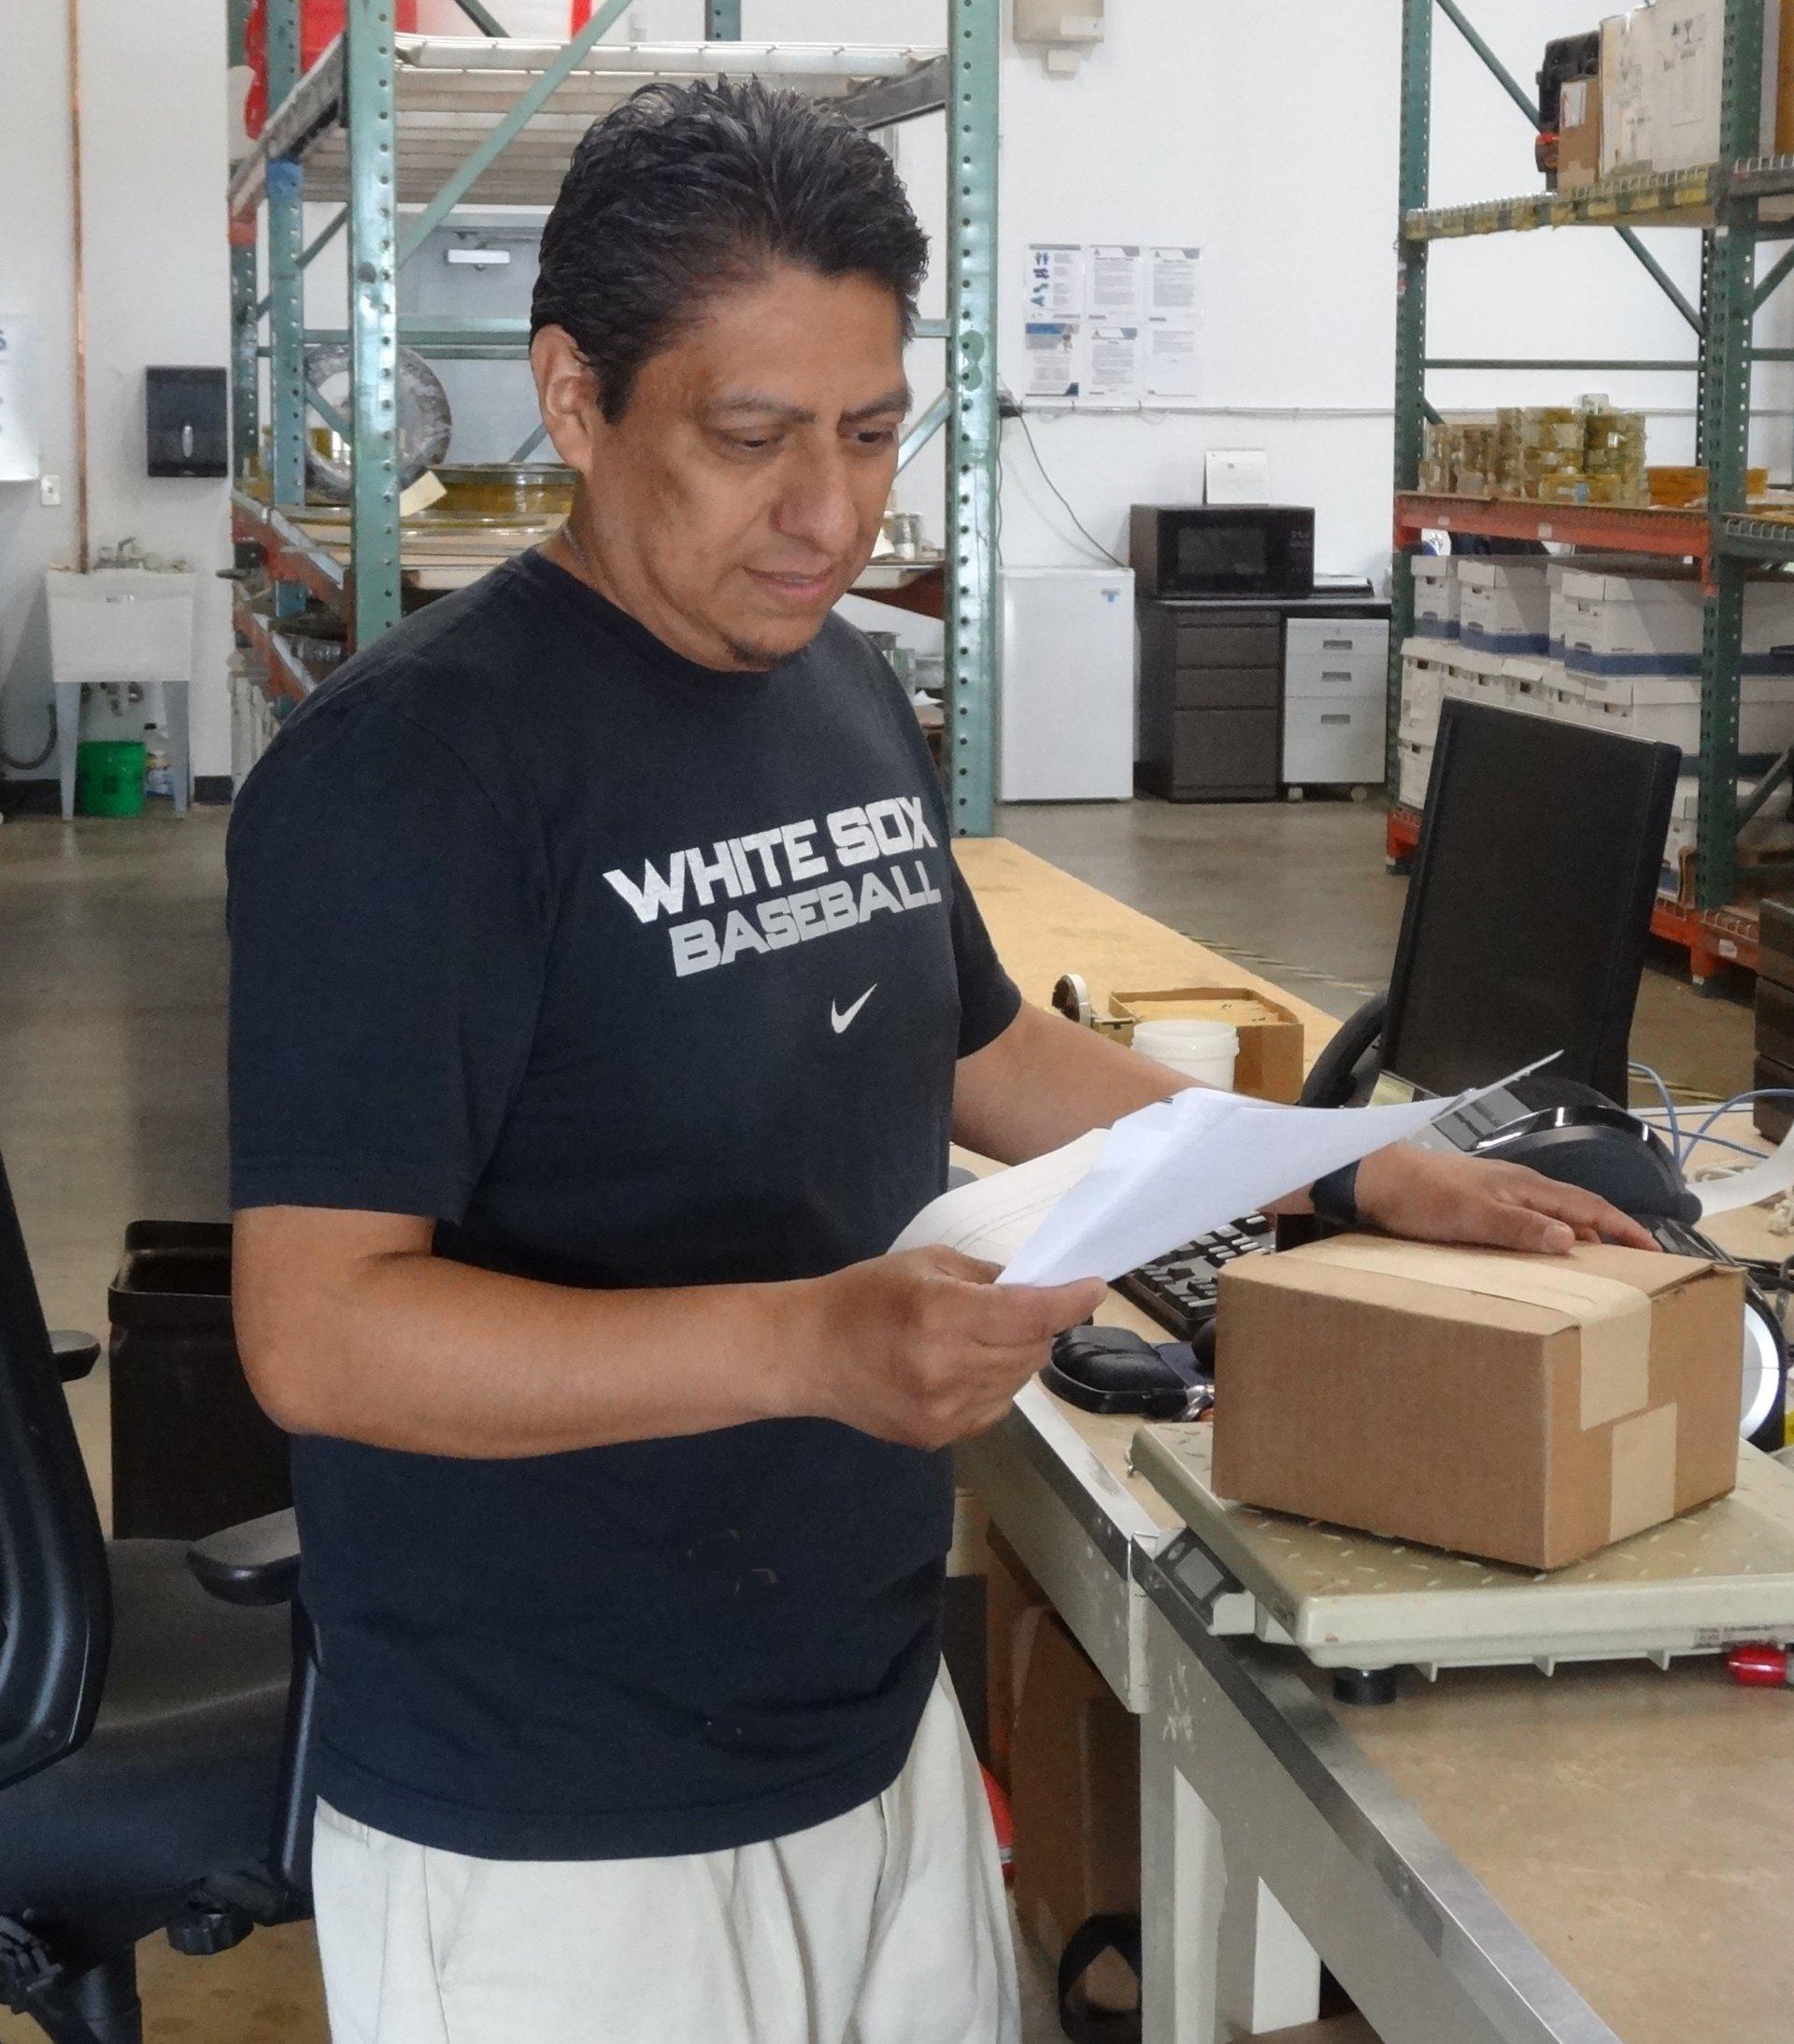 T. Jose Mendez